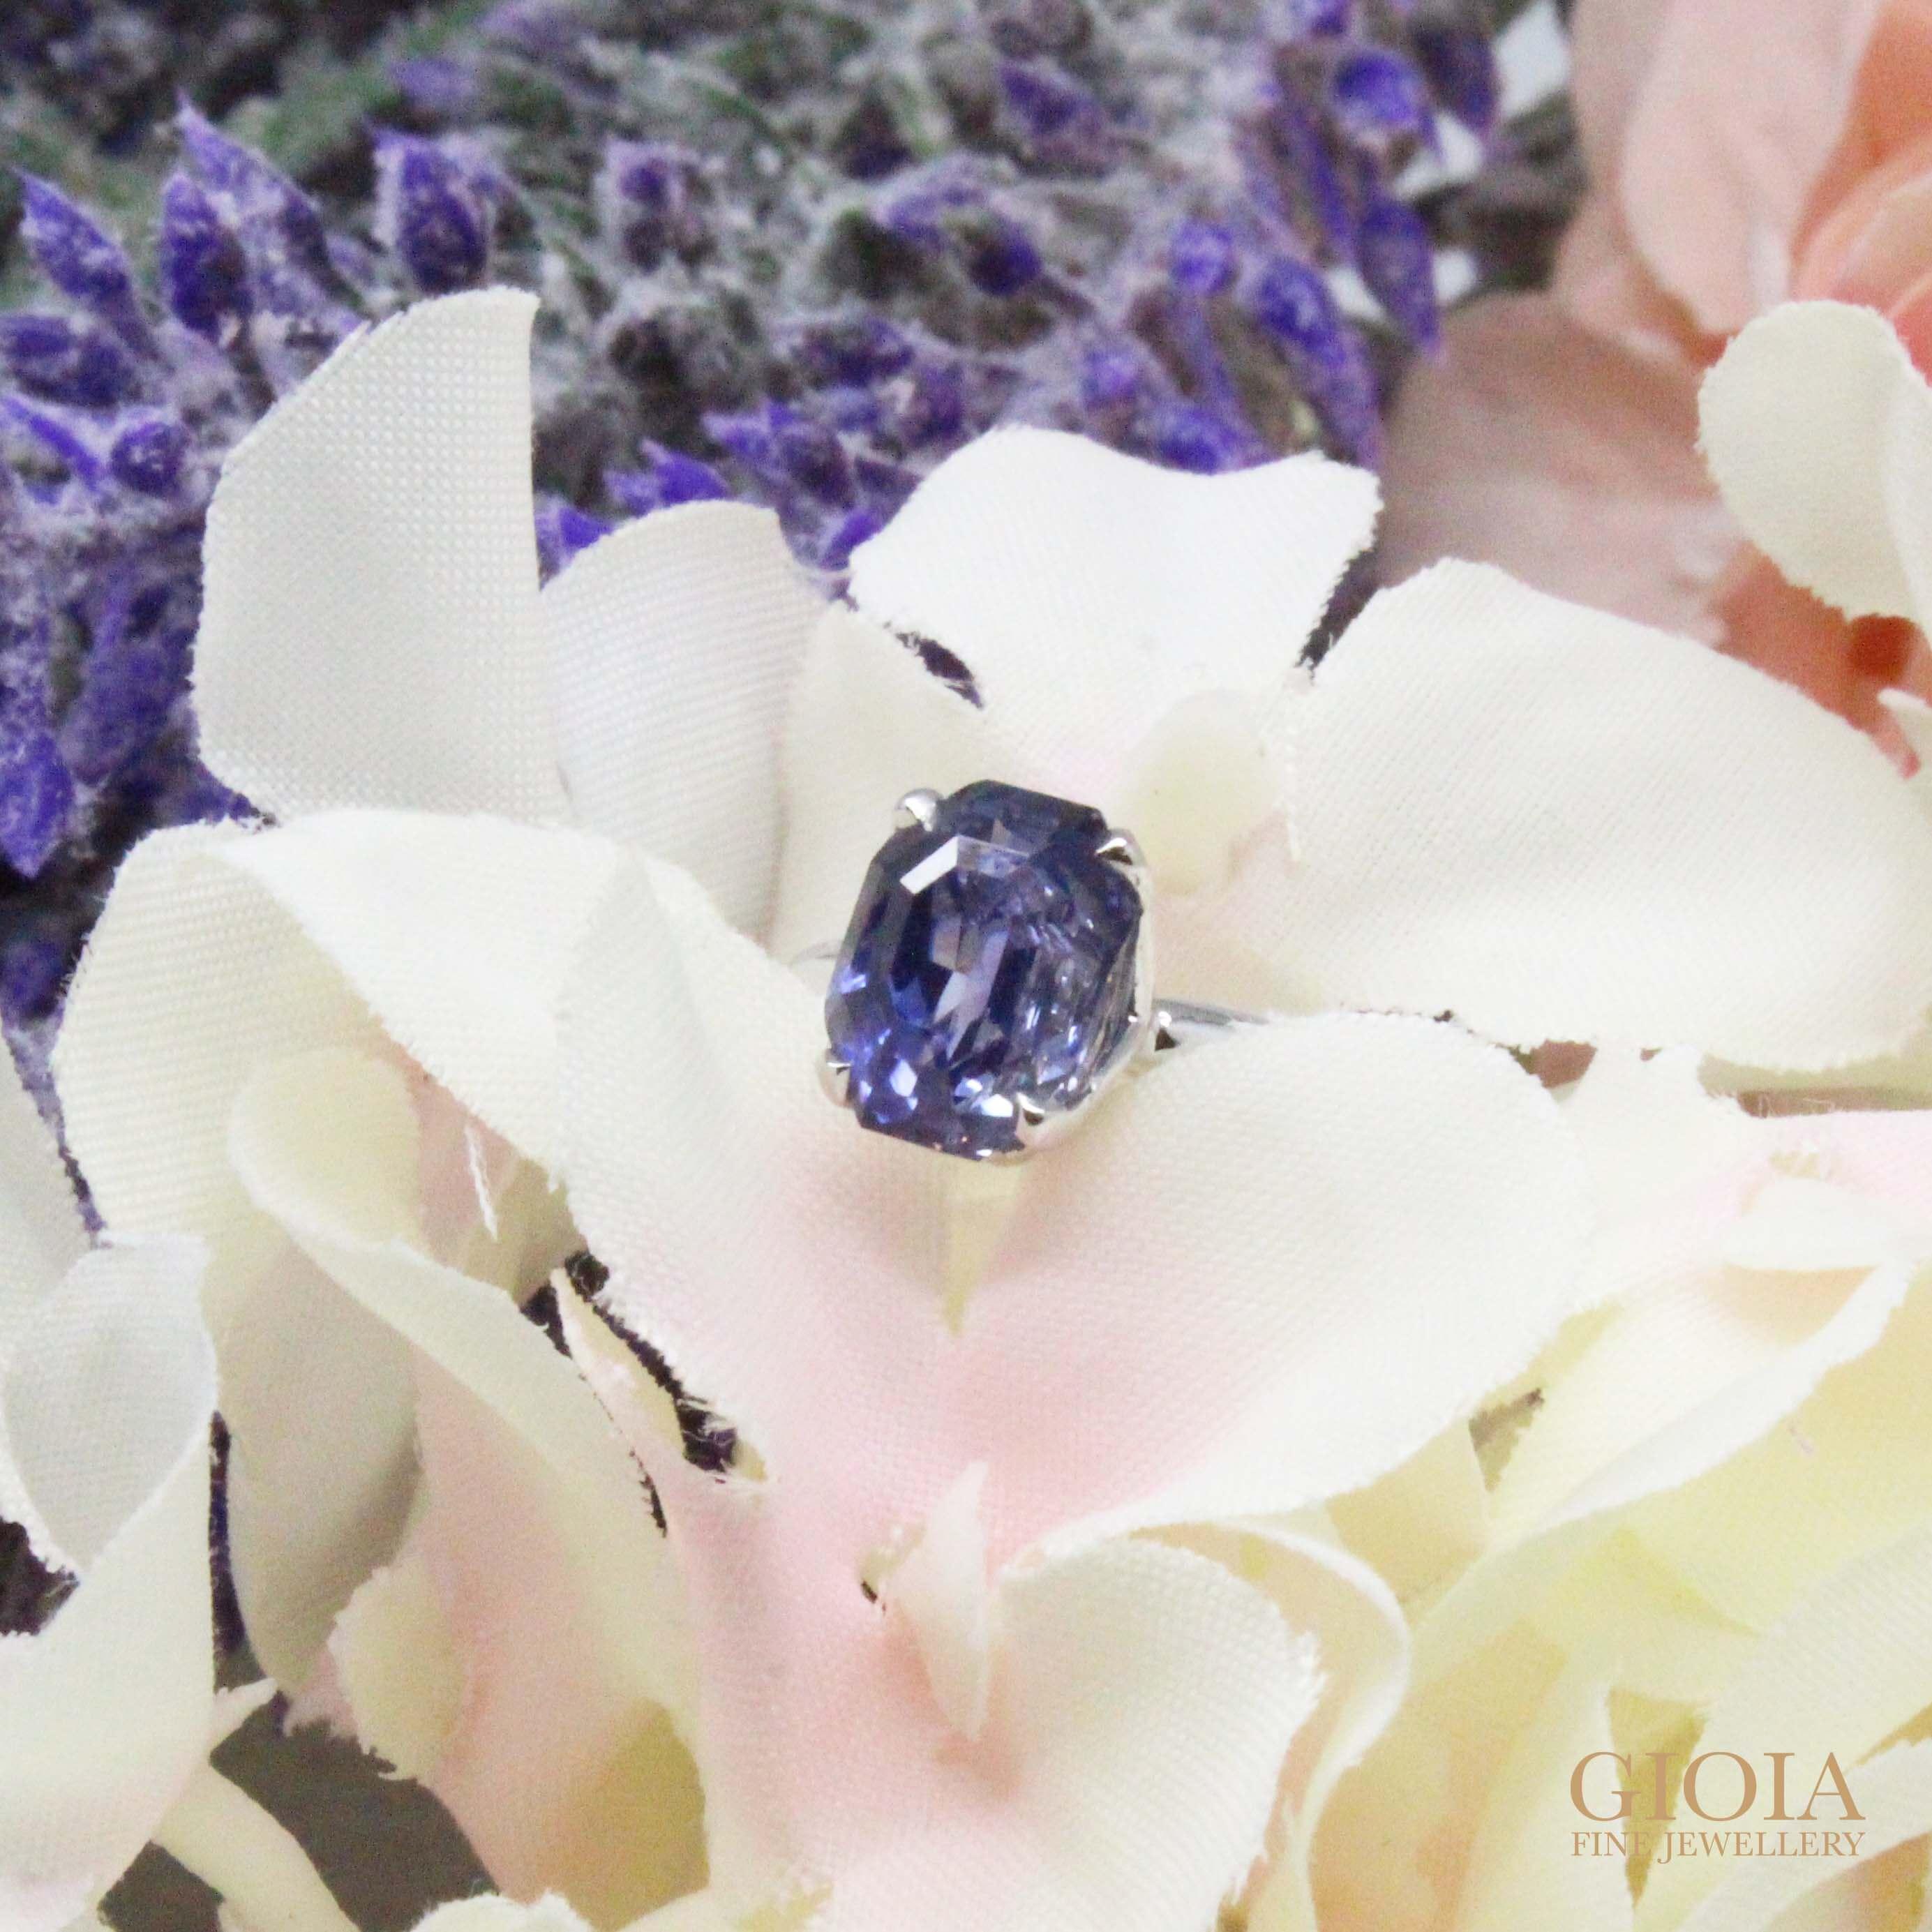 unheat blue sapphire wedding ring - customised wedding engagement ring with rare unheated blue sapphire | Local Singapore Private Jeweller